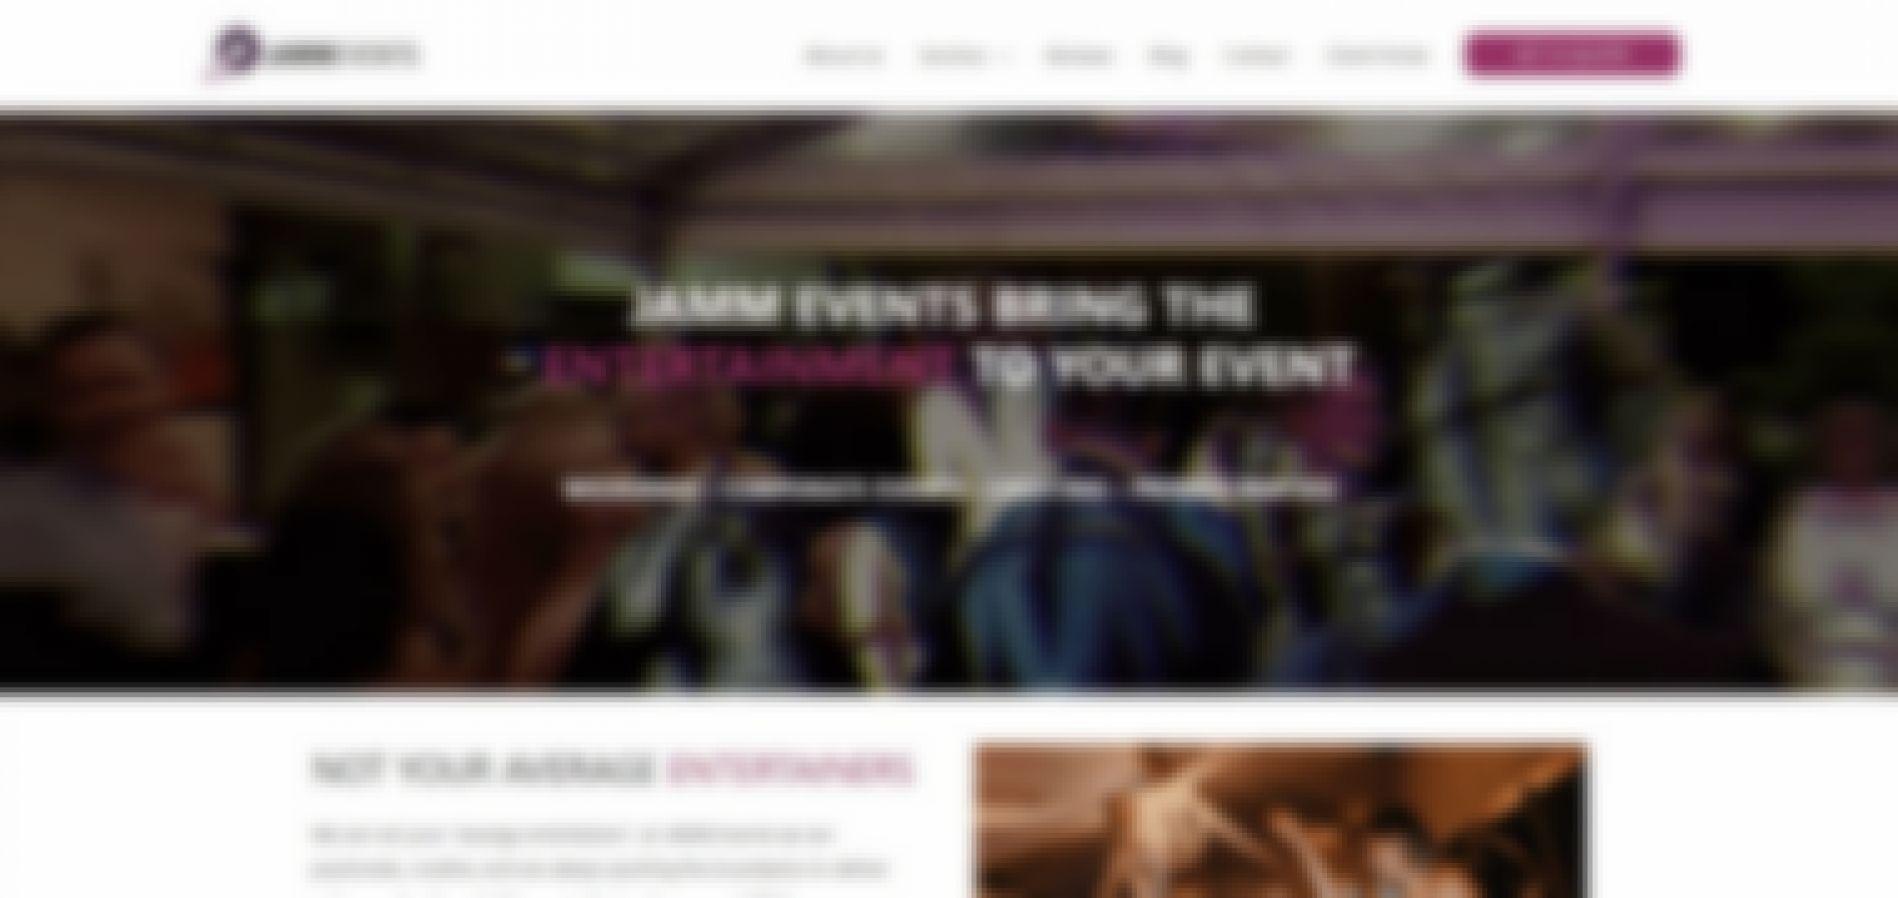 jamm events